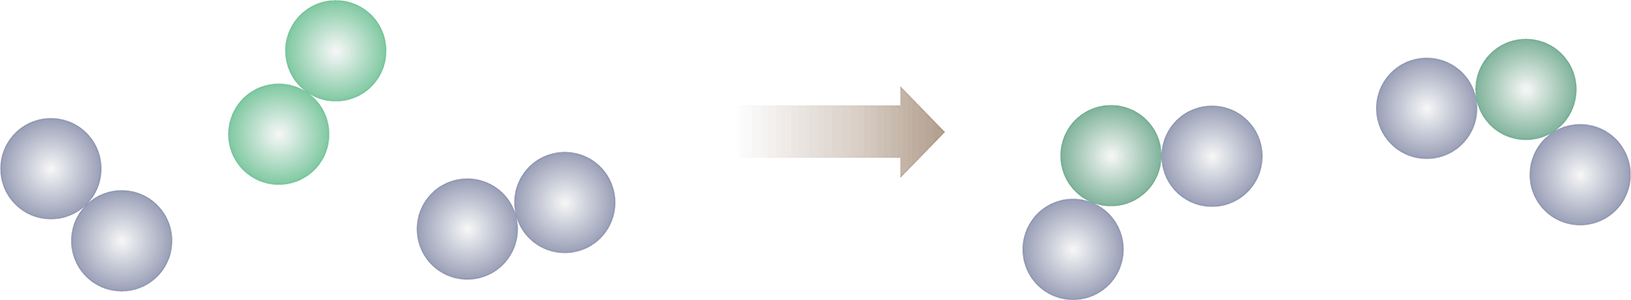 balanced equation particle diagram